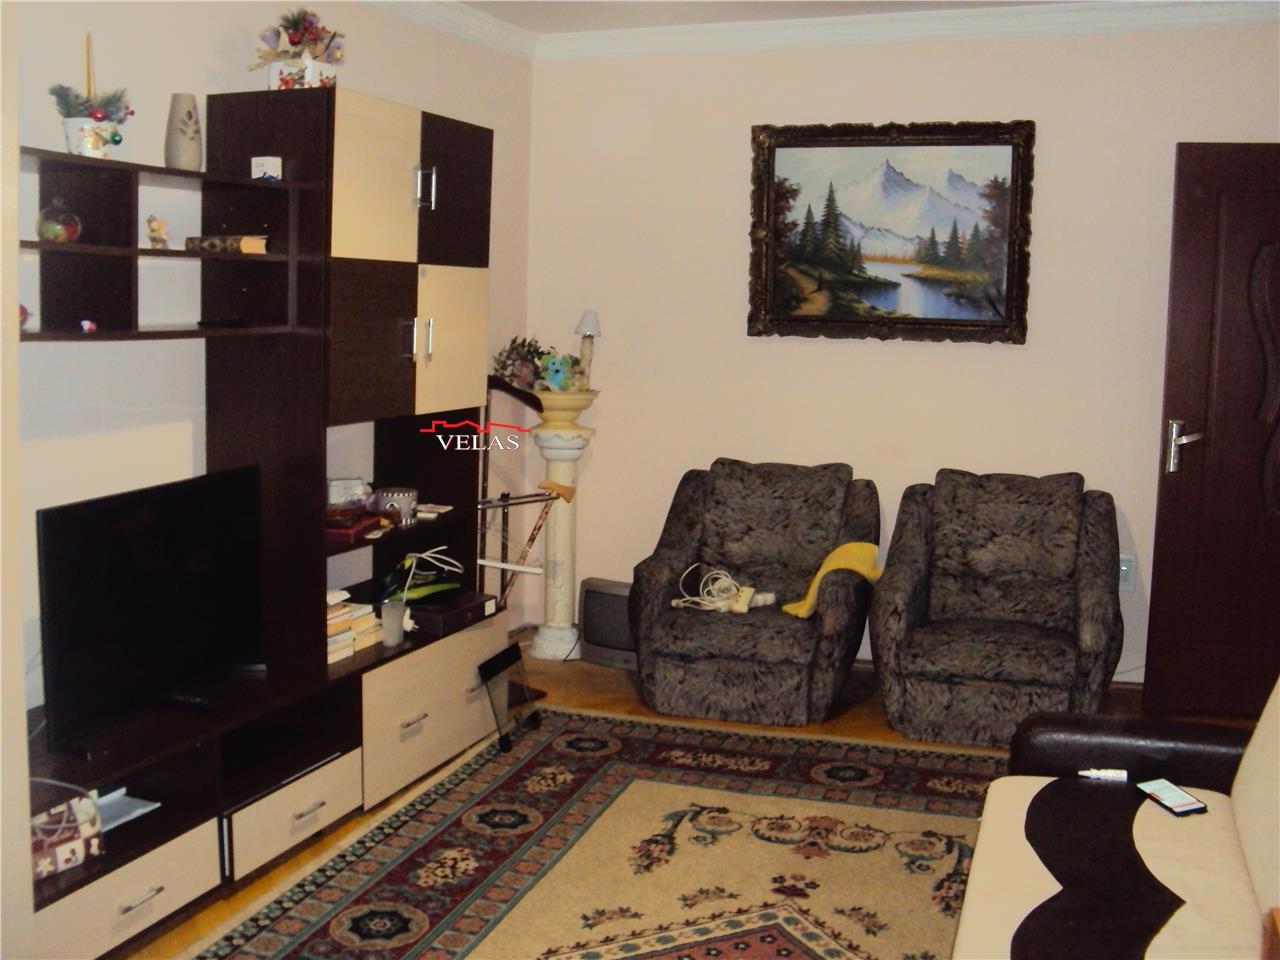 Inchiriez apartament 2 camere, CT, mobilat si utilat, zona Teatru